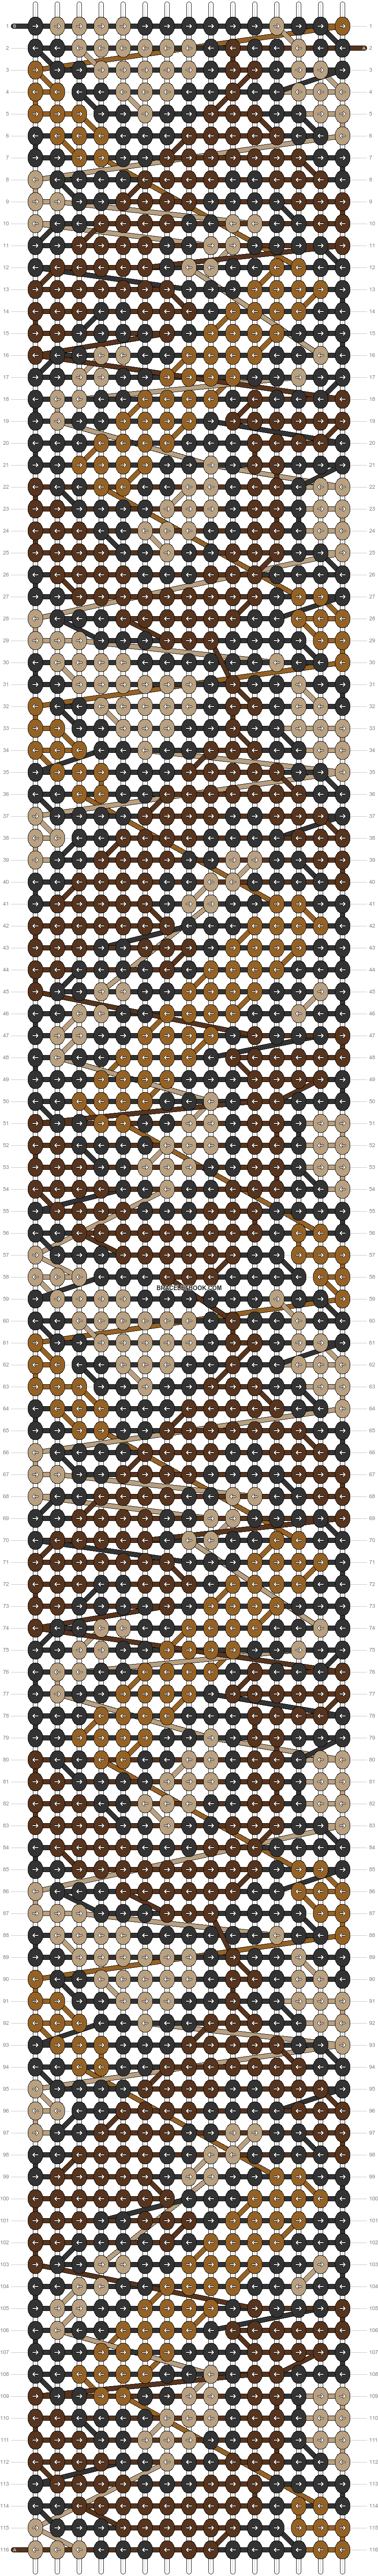 Alpha pattern #49256 pattern